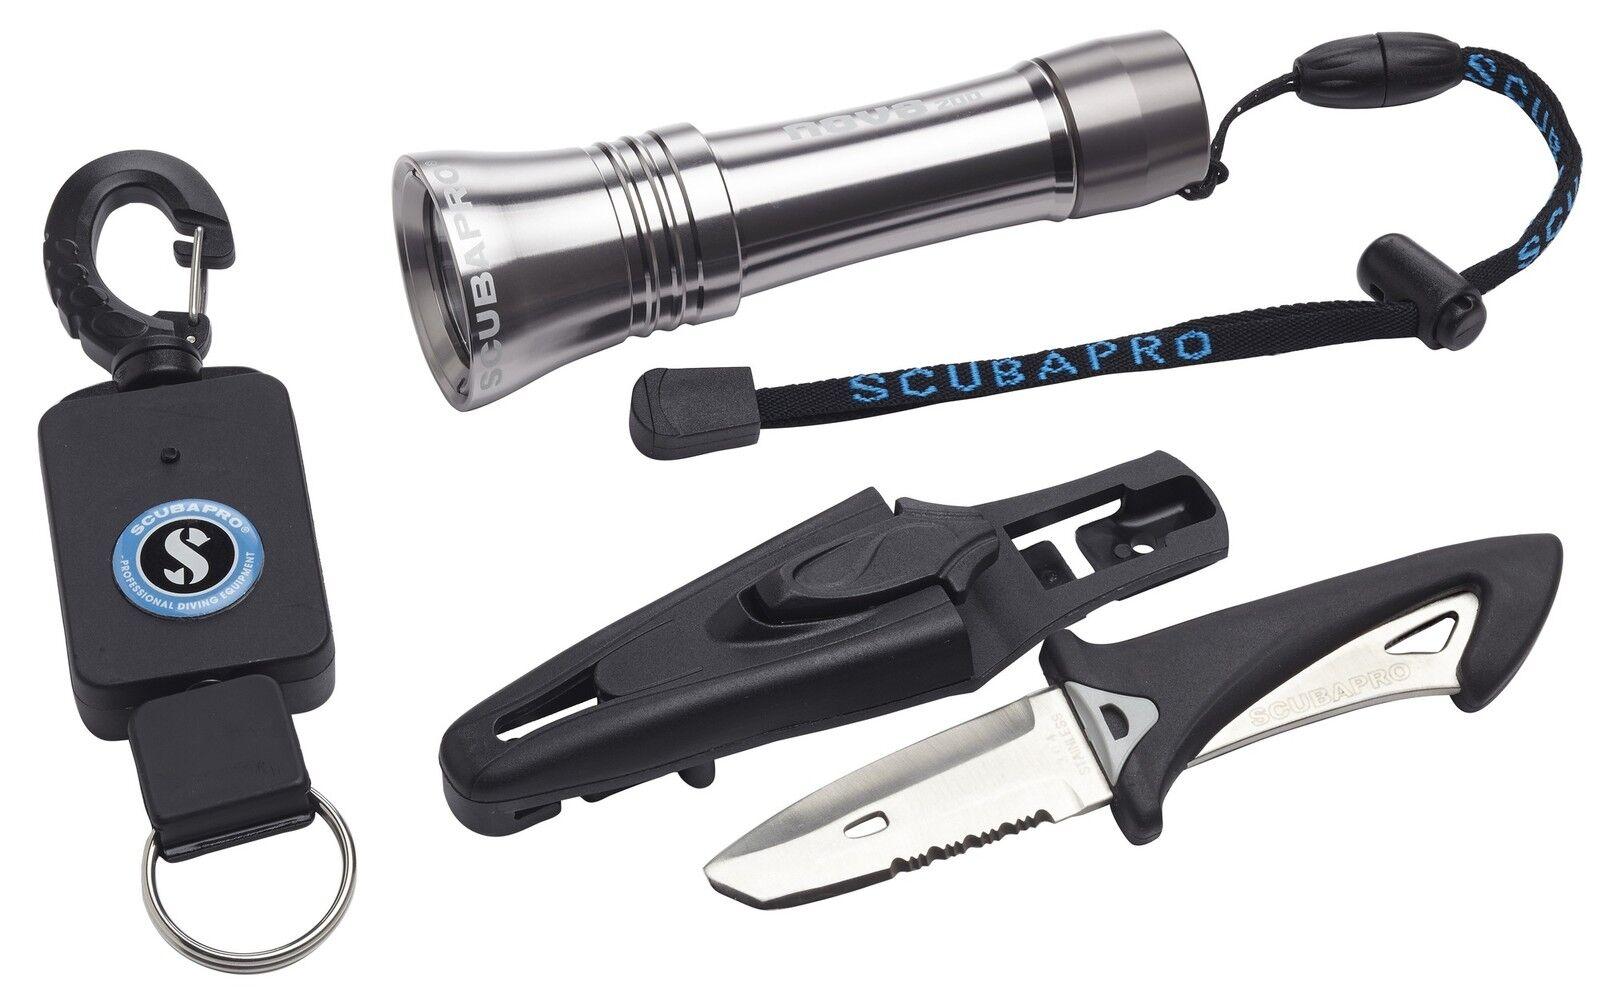 Scubapro Jacket Zubehör-Kit Accessory Kit Taucherlampe, Messer, Retractor